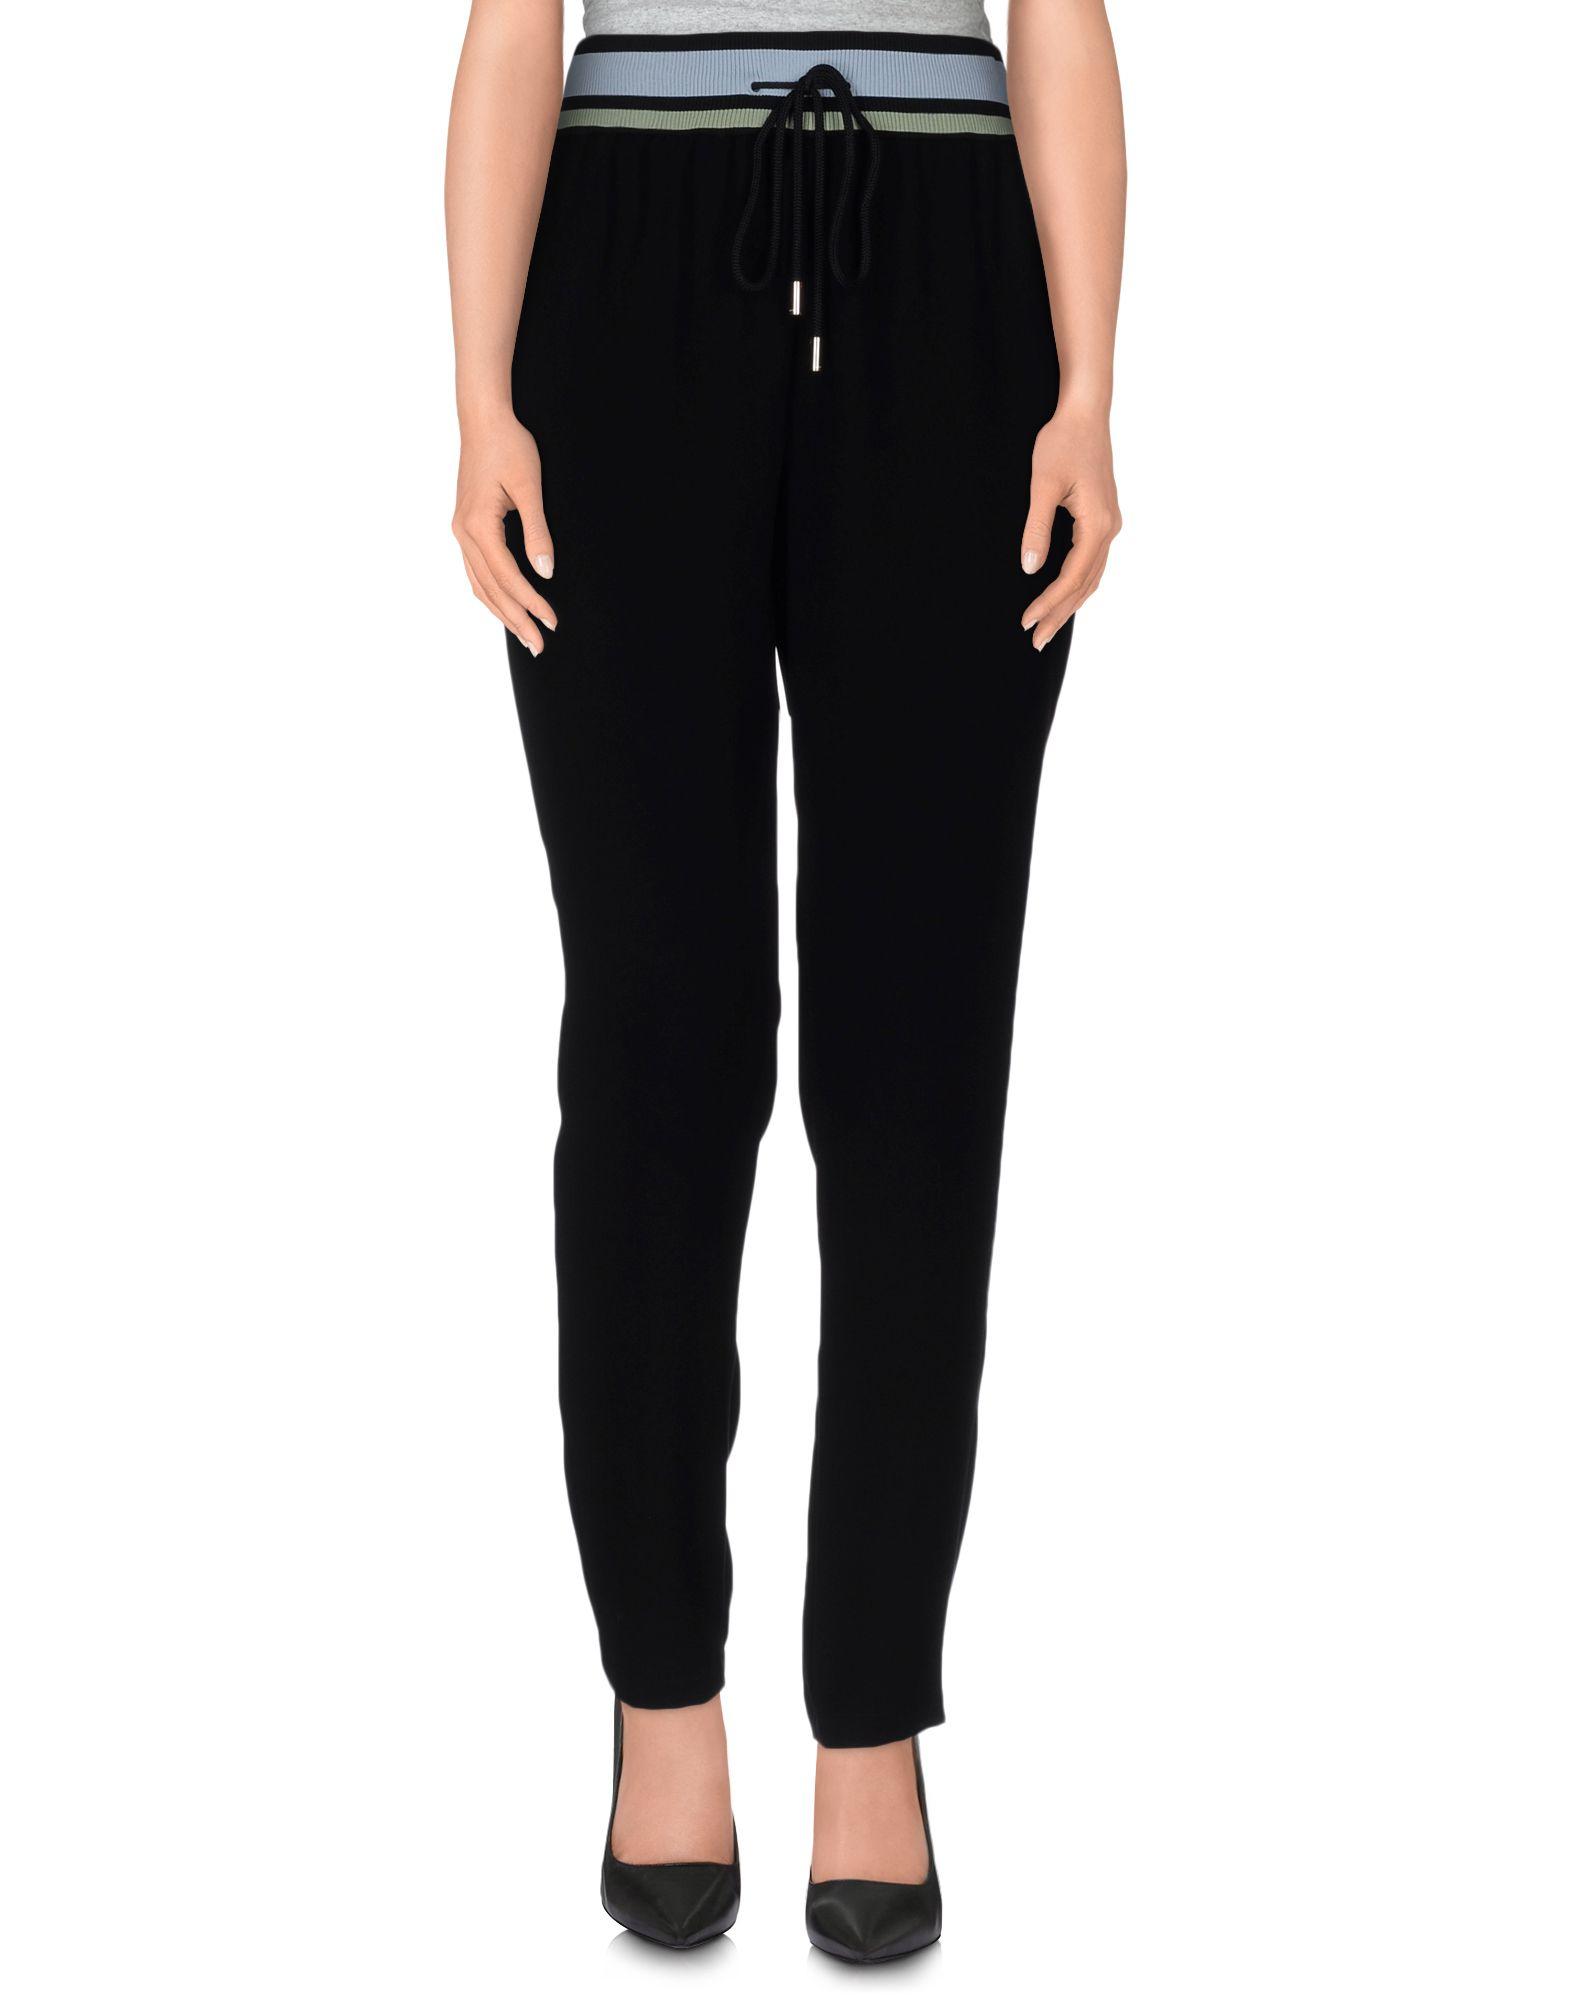 Wonderful  Jersey Stirrup Legging  Gucci Women39s Pants Amp Shorts 471452X5S58